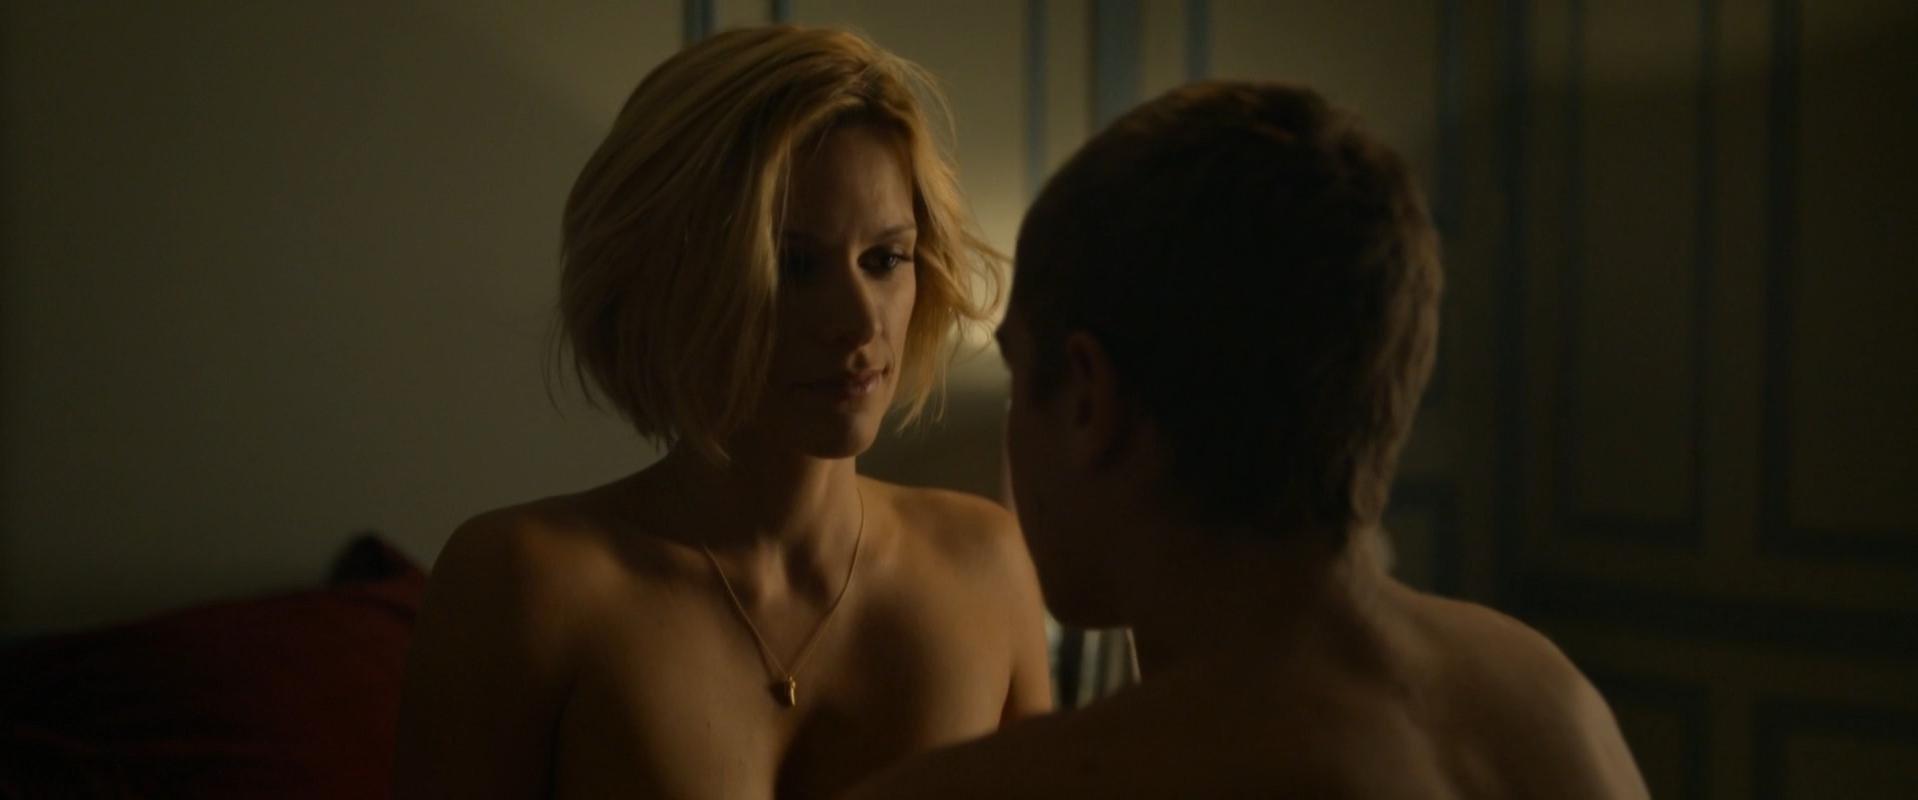 Veerle Baetens nude - Un debut prometteur (2015)